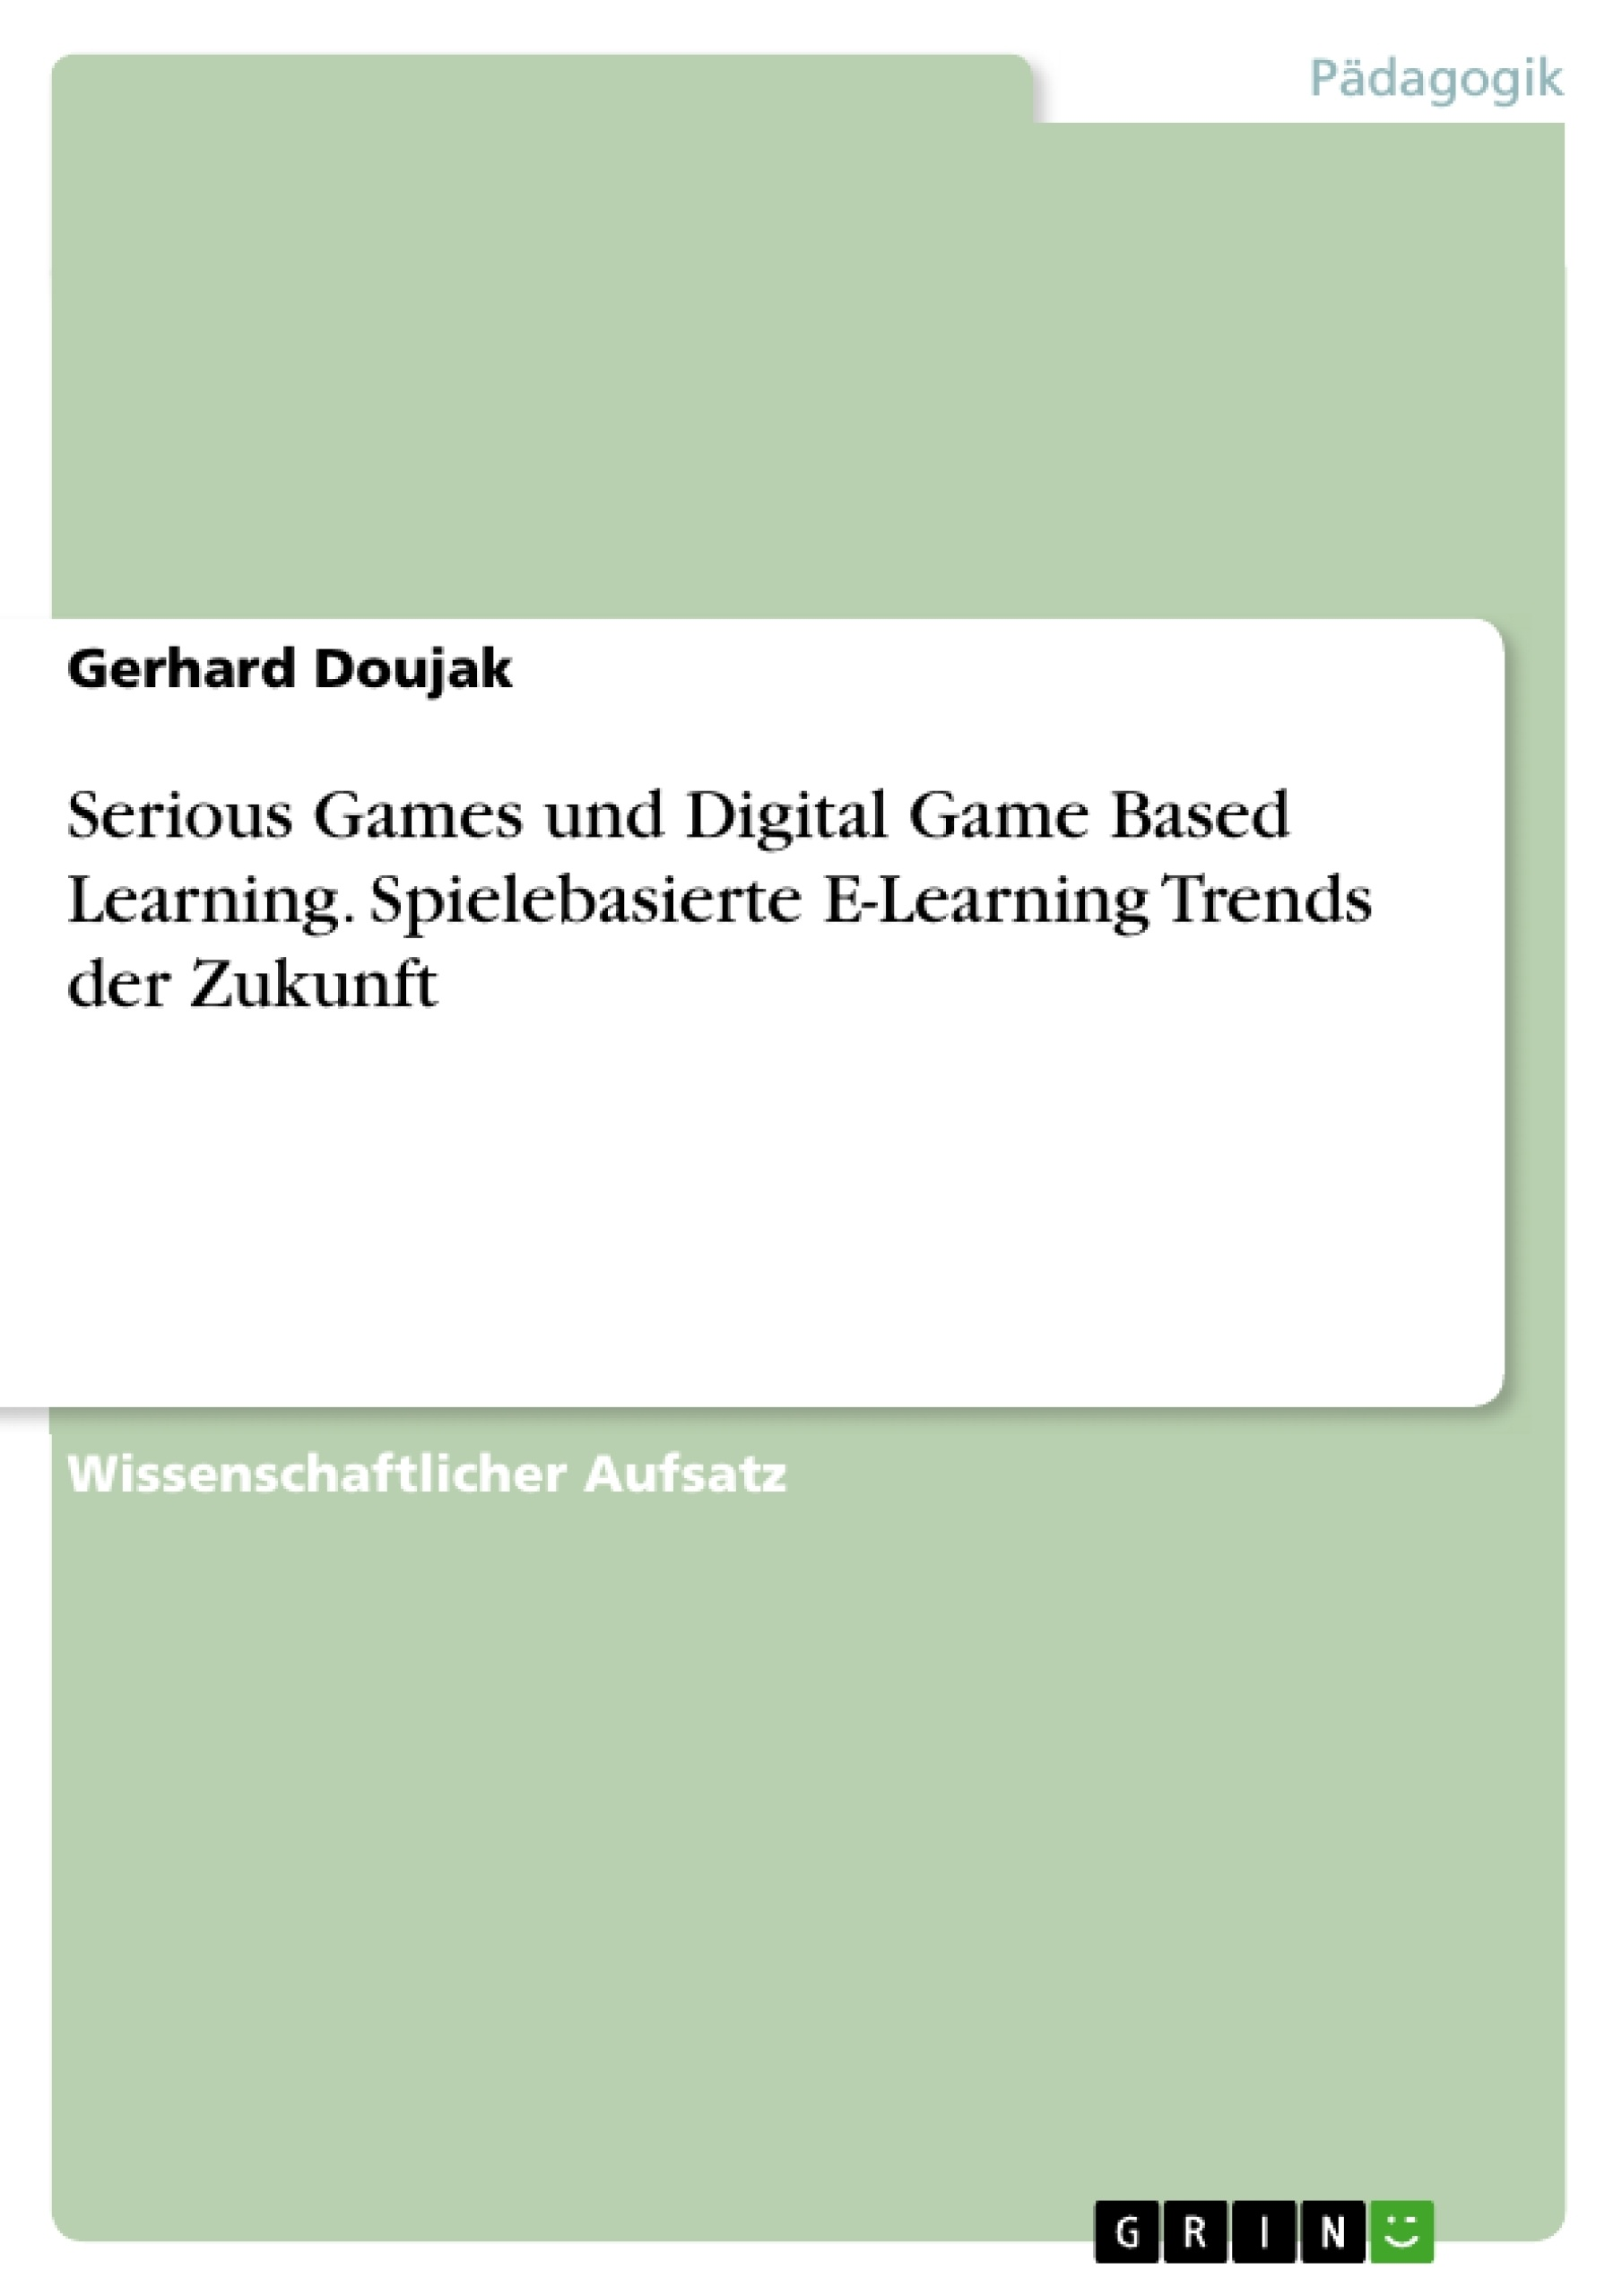 Titel: Serious Games und Digital Game Based Learning. Spielebasierte E-Learning Trends der Zukunft